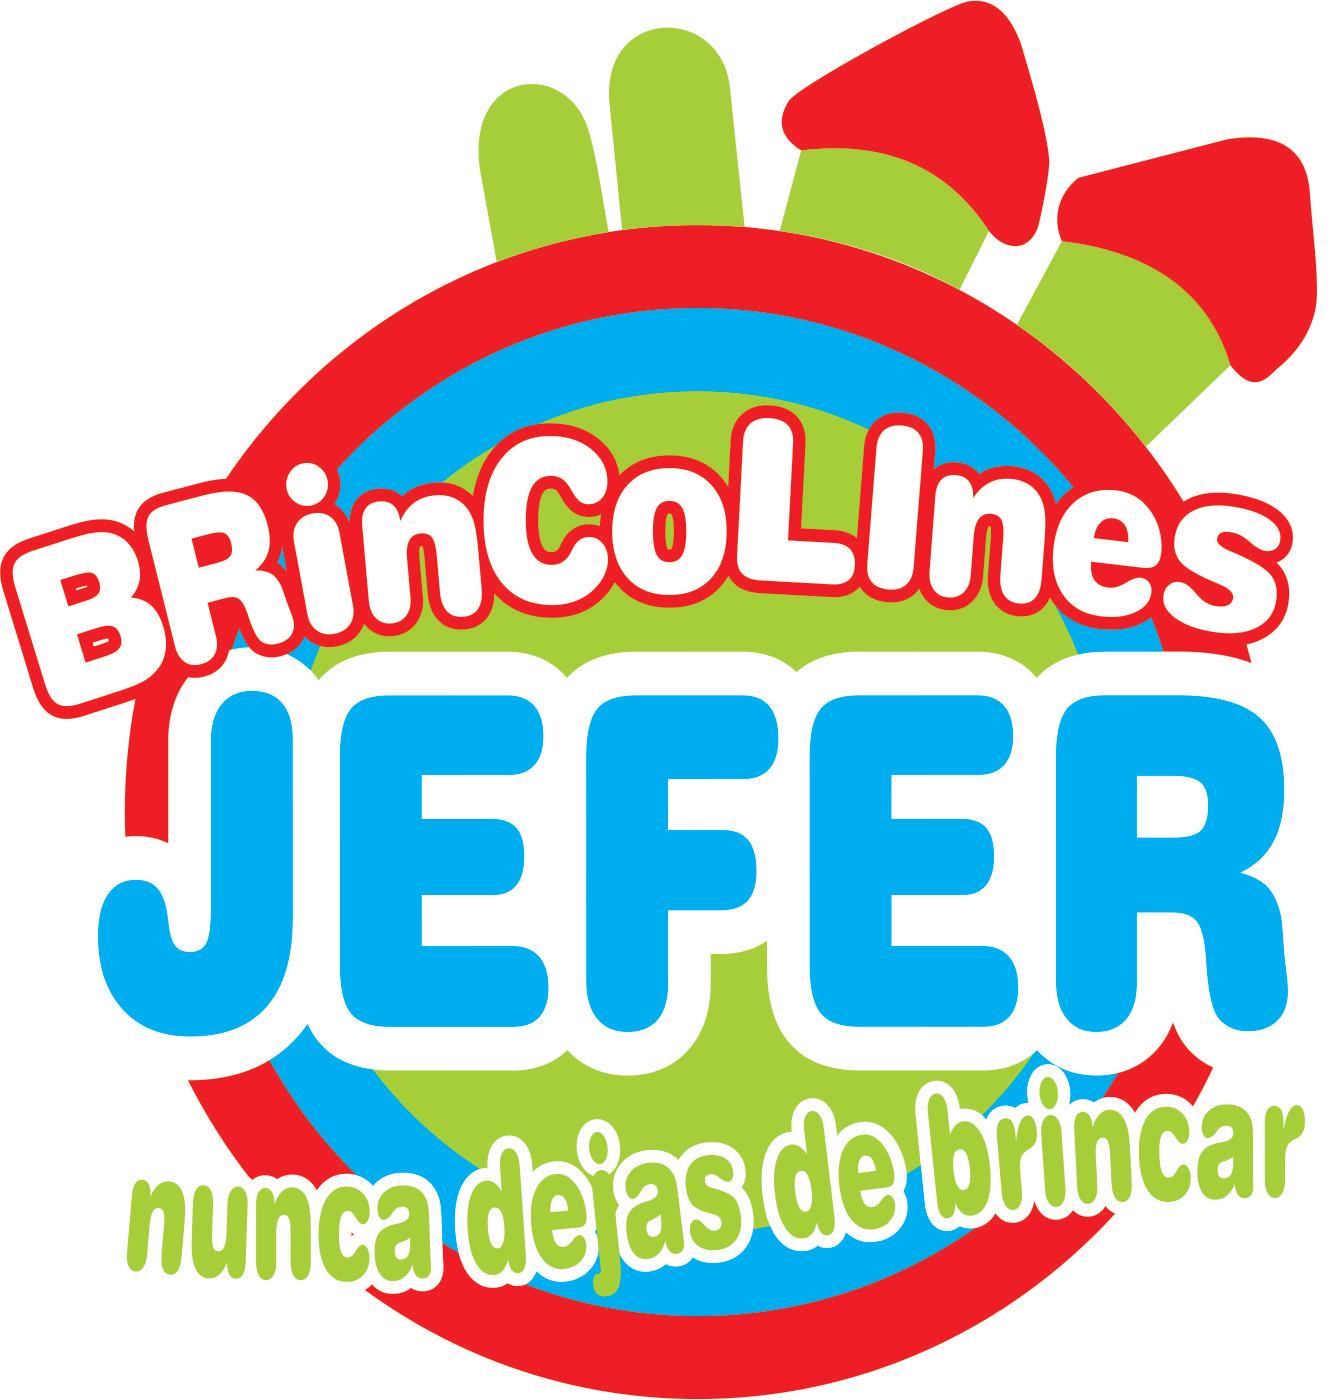 BRINCOLINES JEFER LOGO PLAYERA F